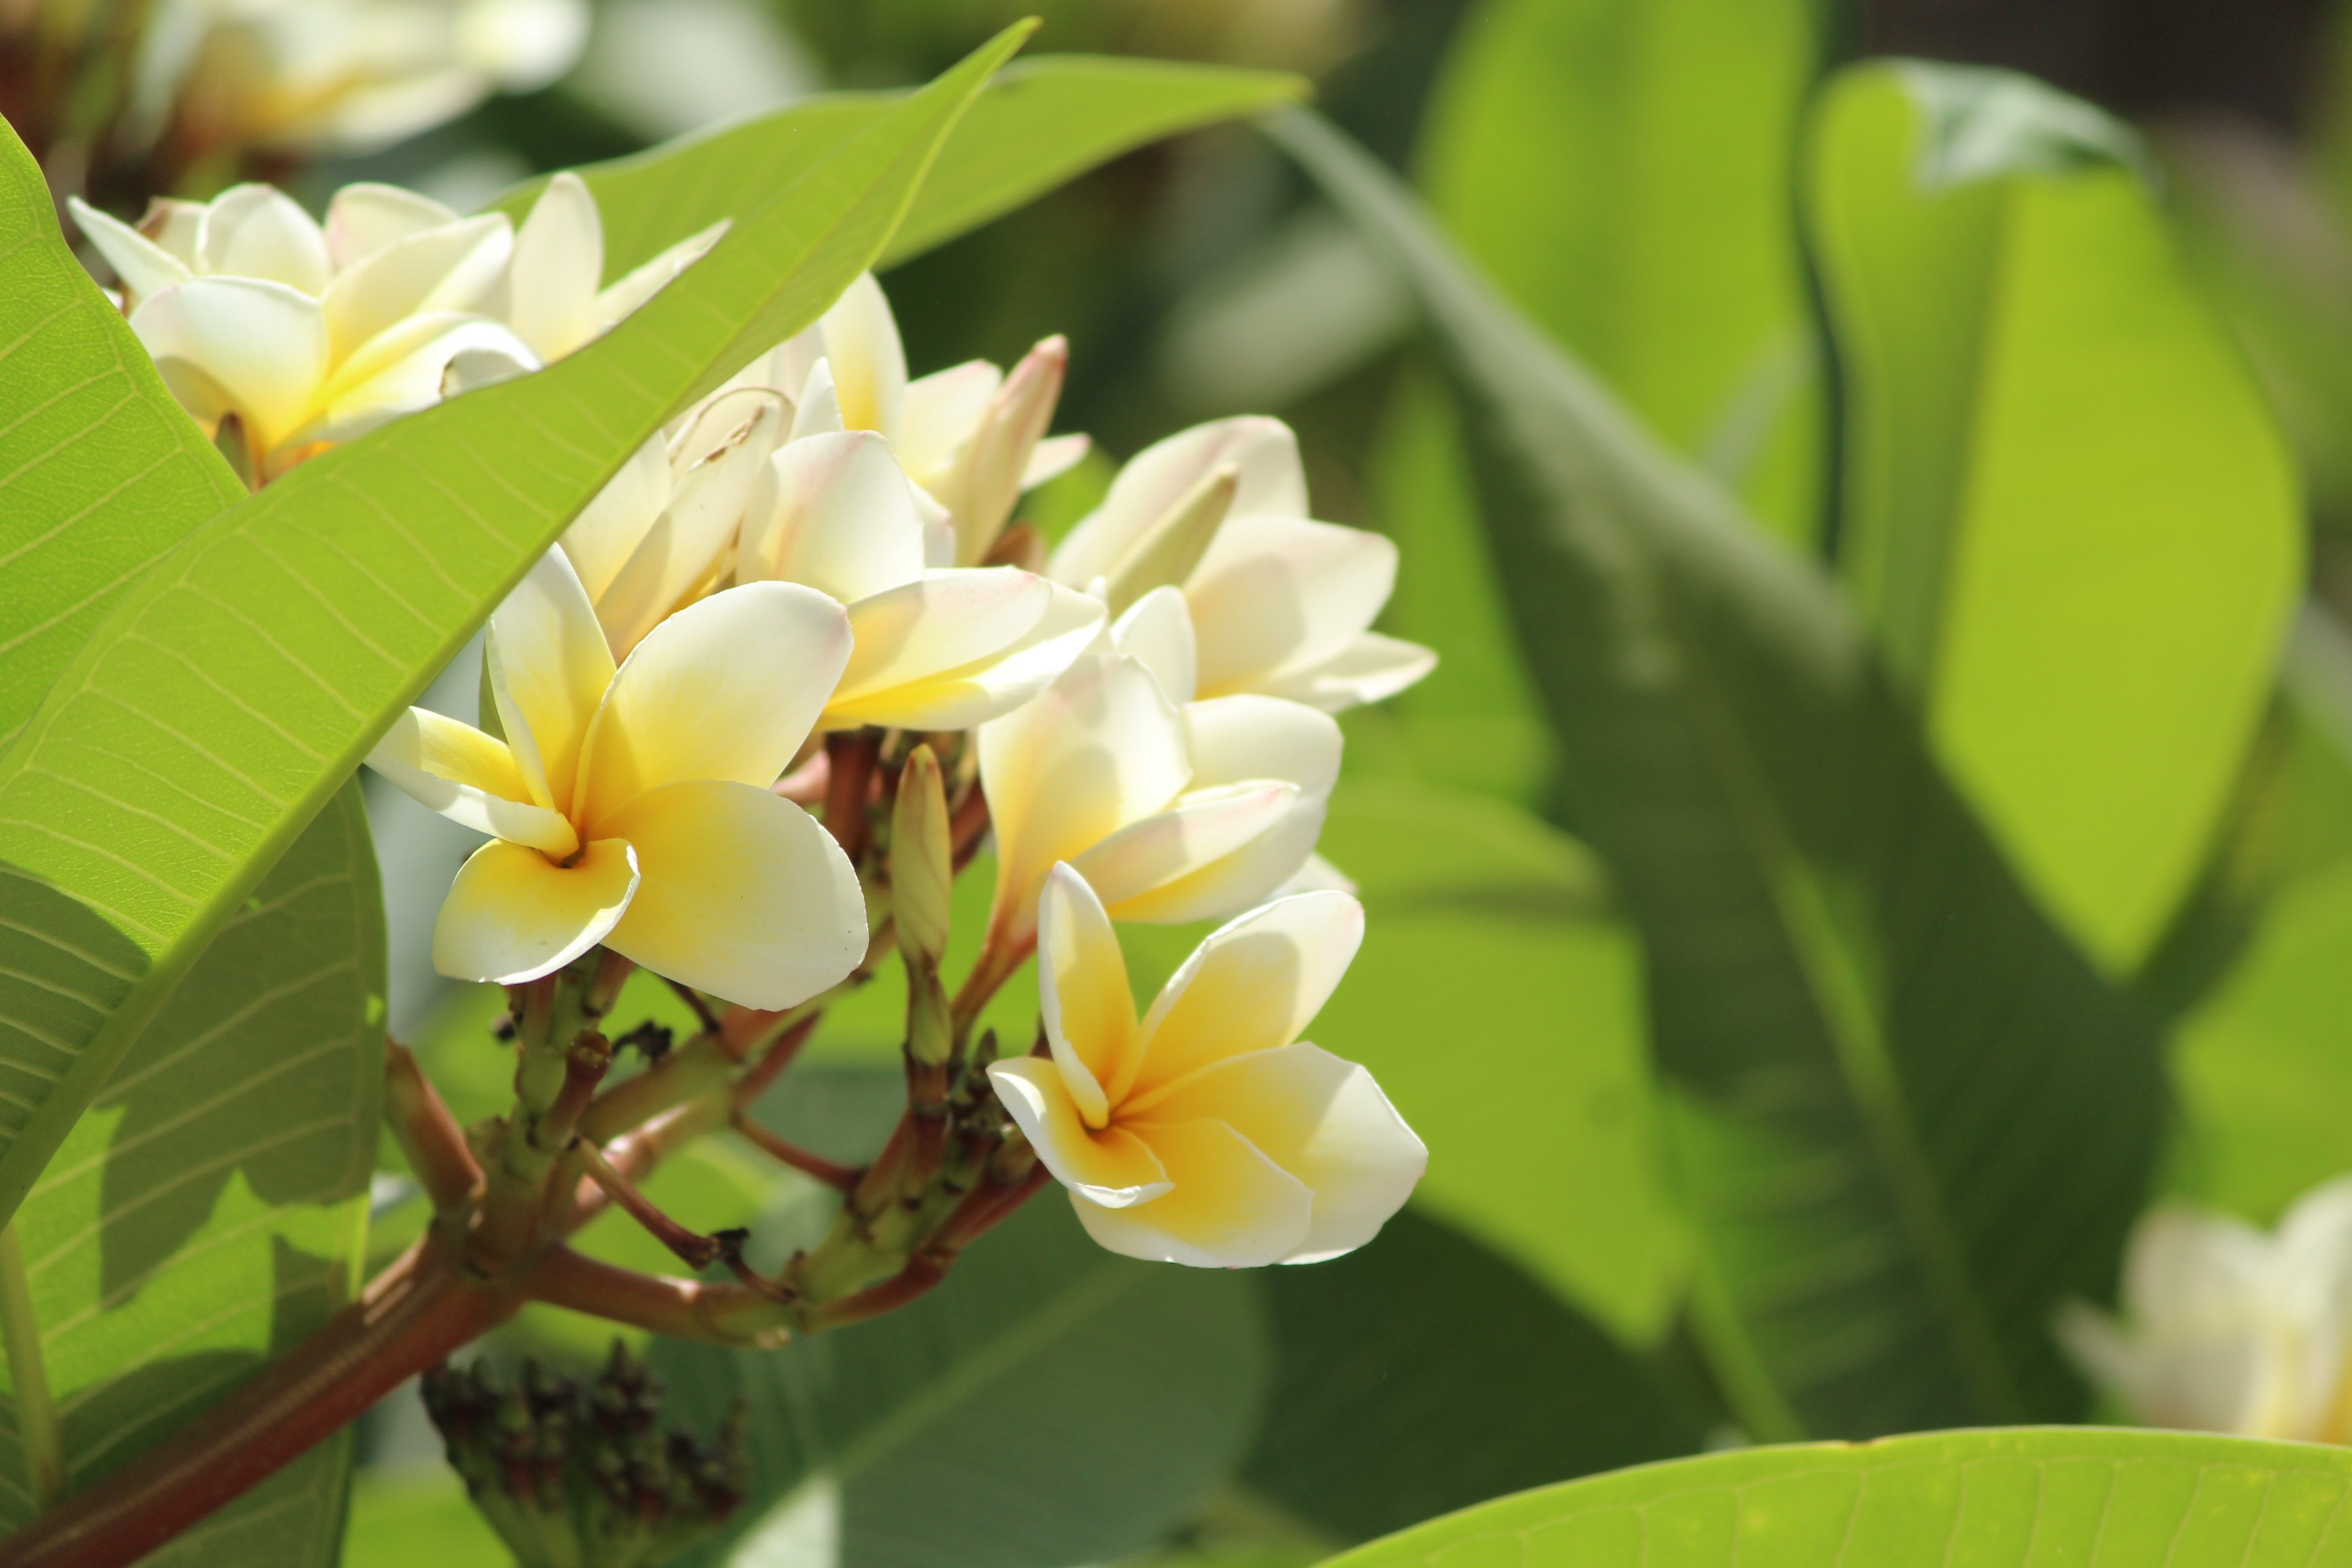 General 3456x2304 macro Plumeria flowers plants white flowers